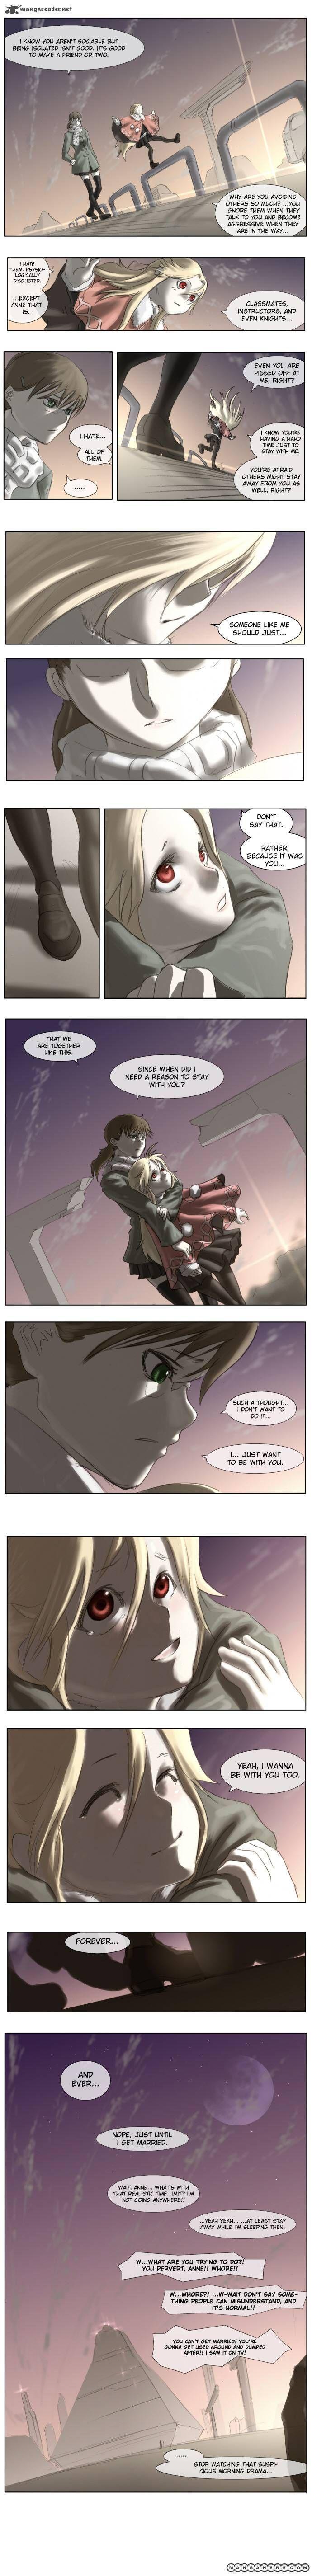 Knight Run 26 Page 4